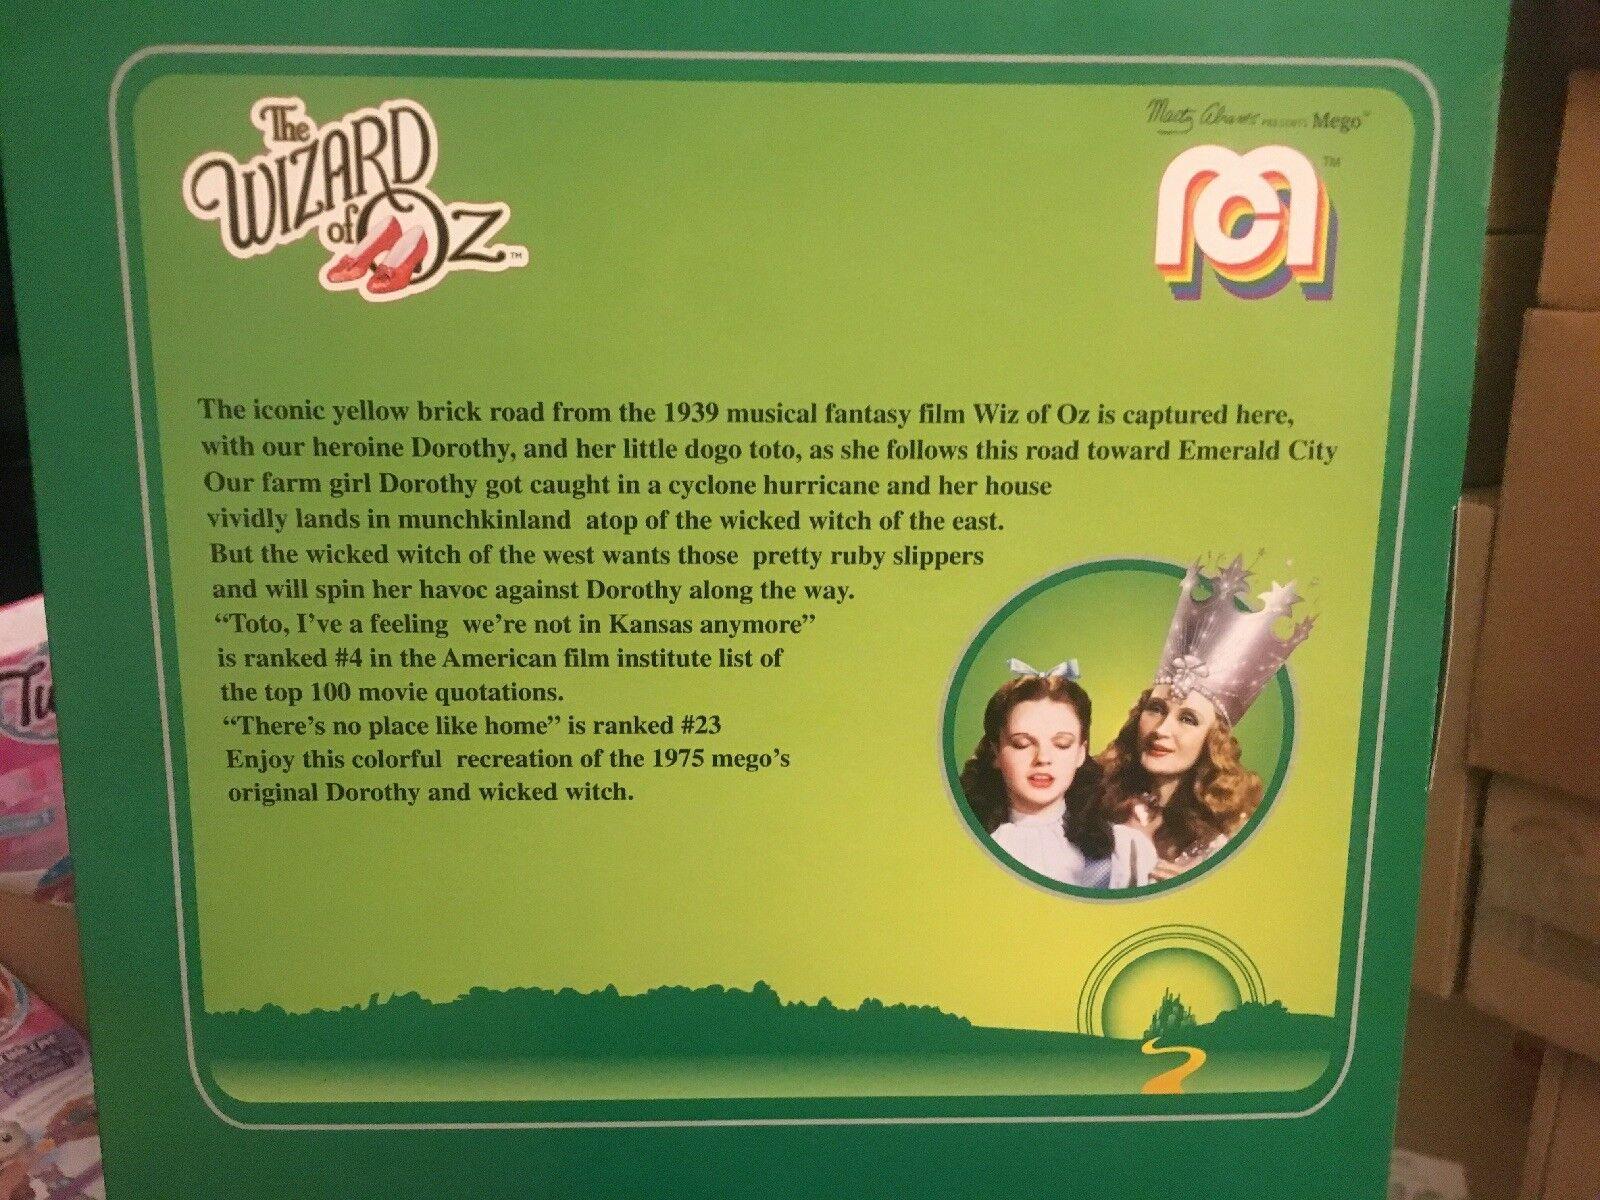 MEGO WIZARD WIZARD WIZARD OF OZ BOX SET TARGET EXCLUSIVE  LOW SER 10000  c72f6d